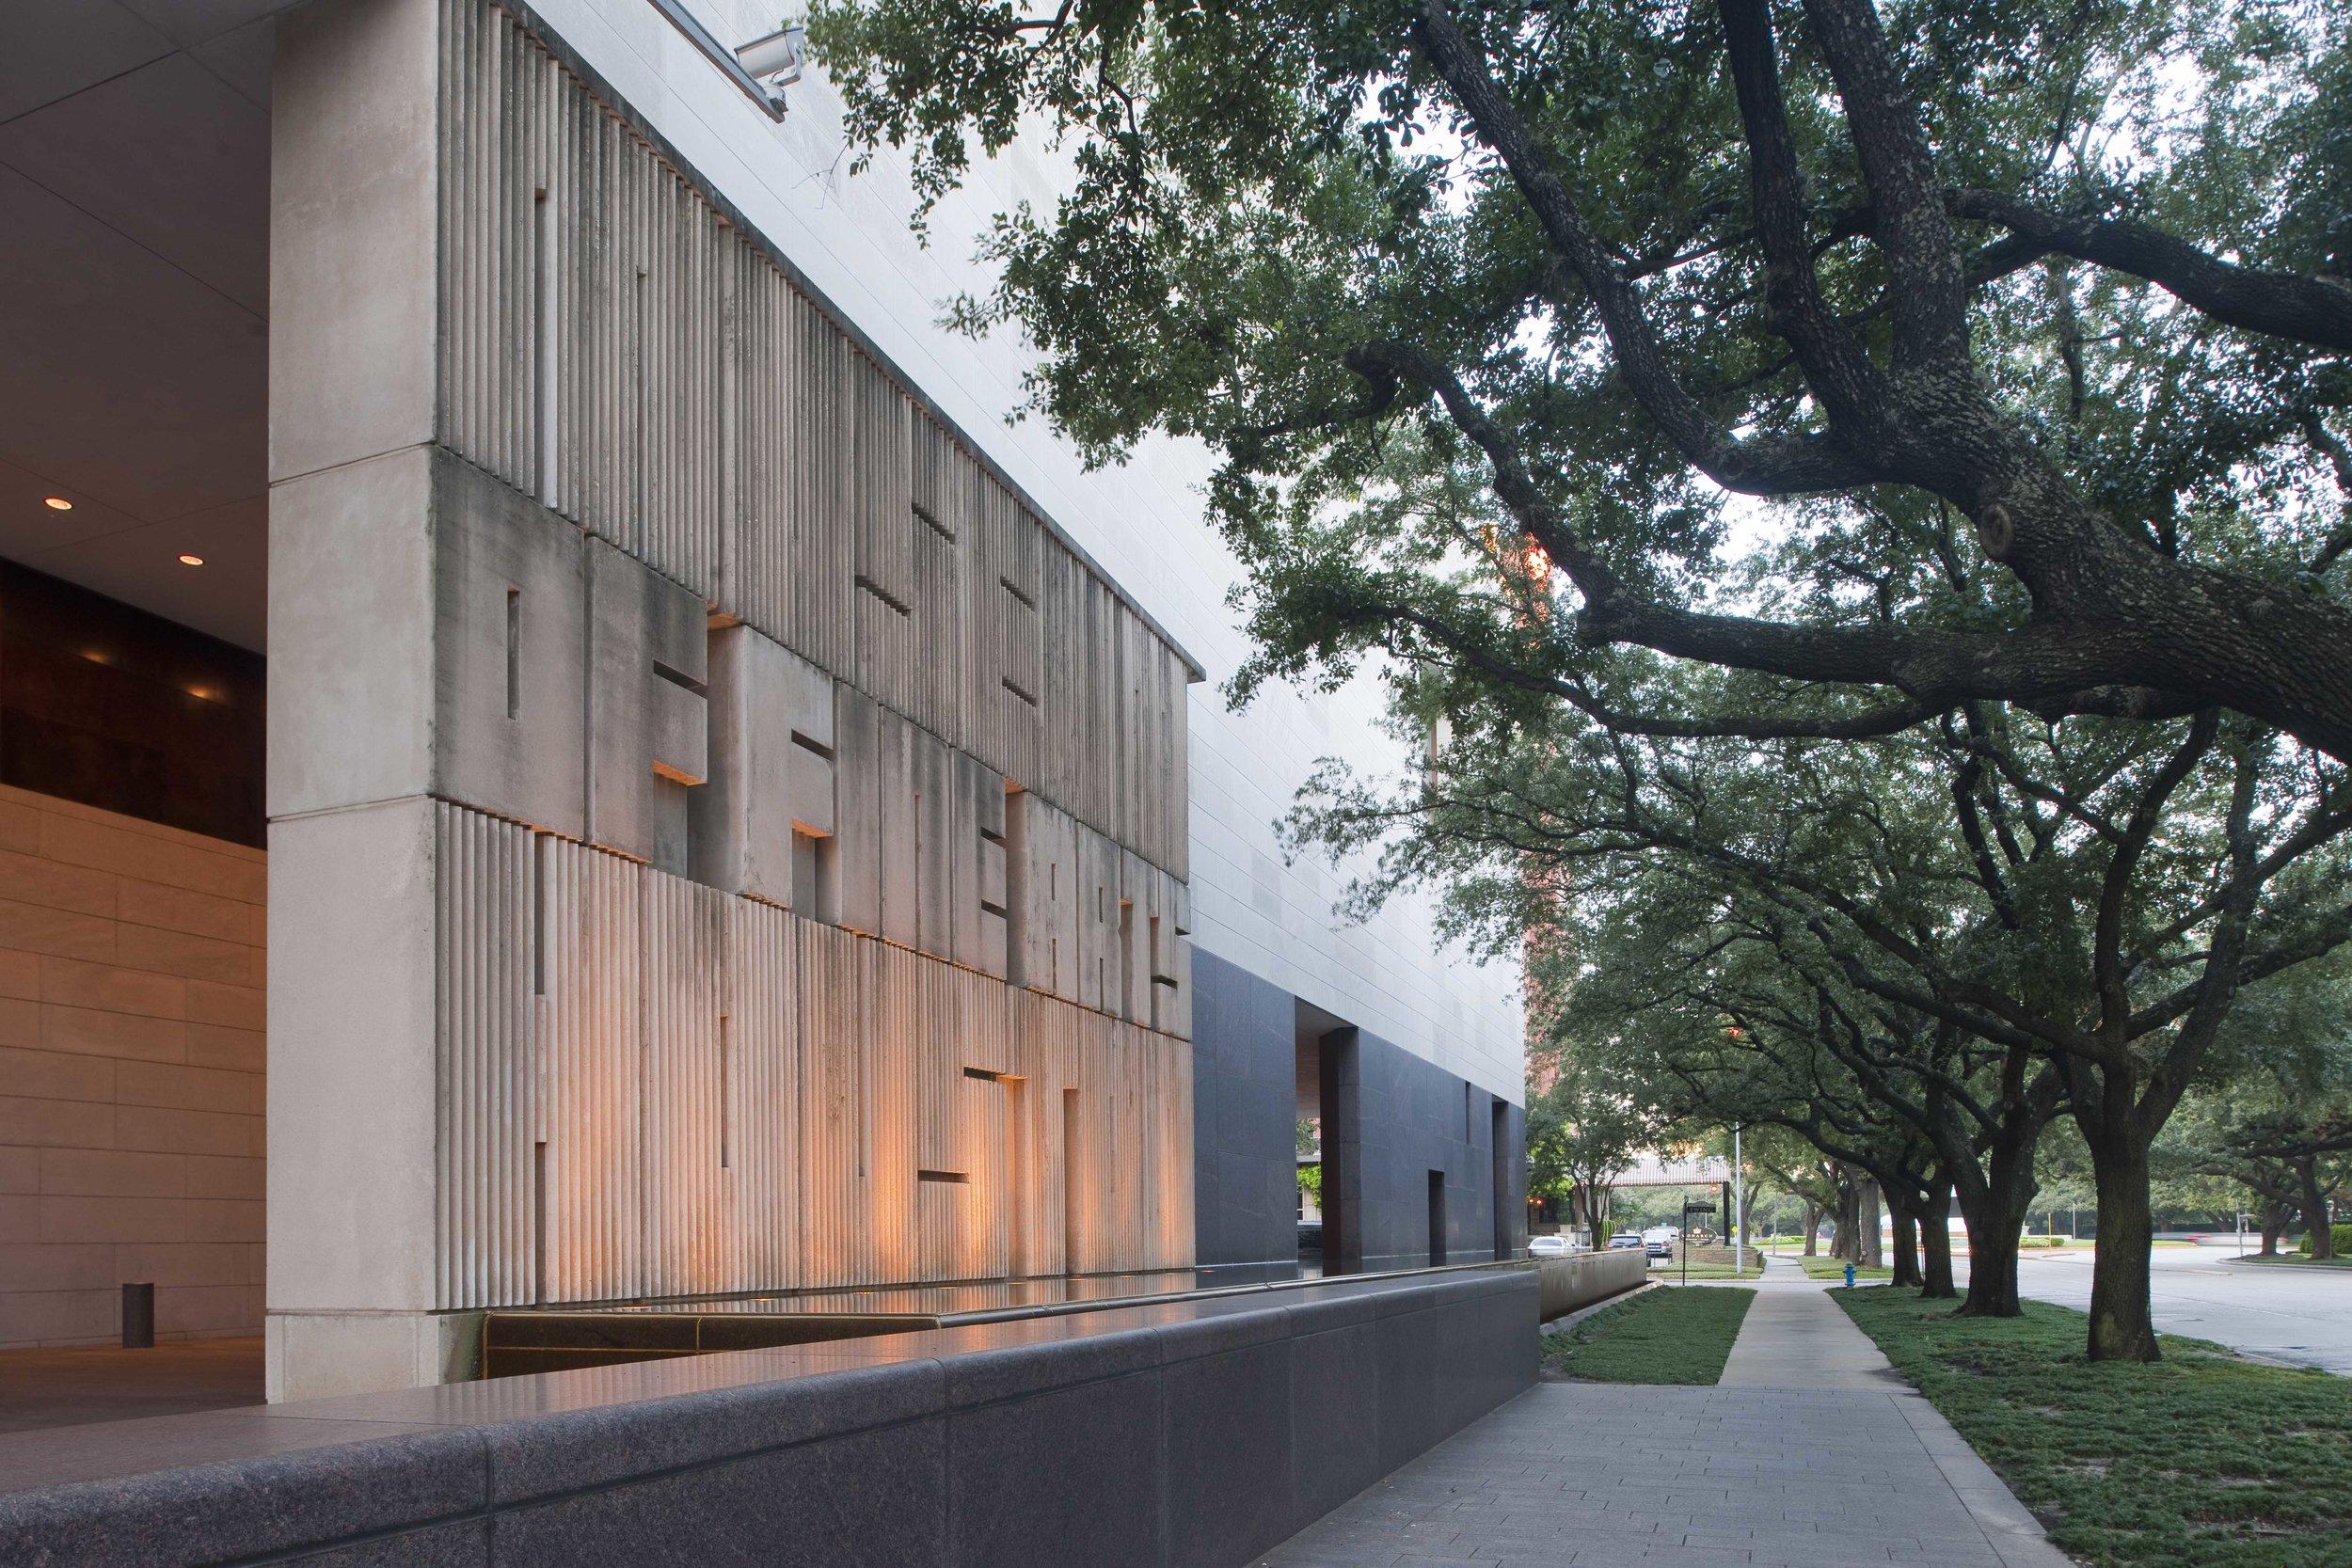 MFAH_Beck-Building-exterior-Photo-by-Robb-Williamson.jpg